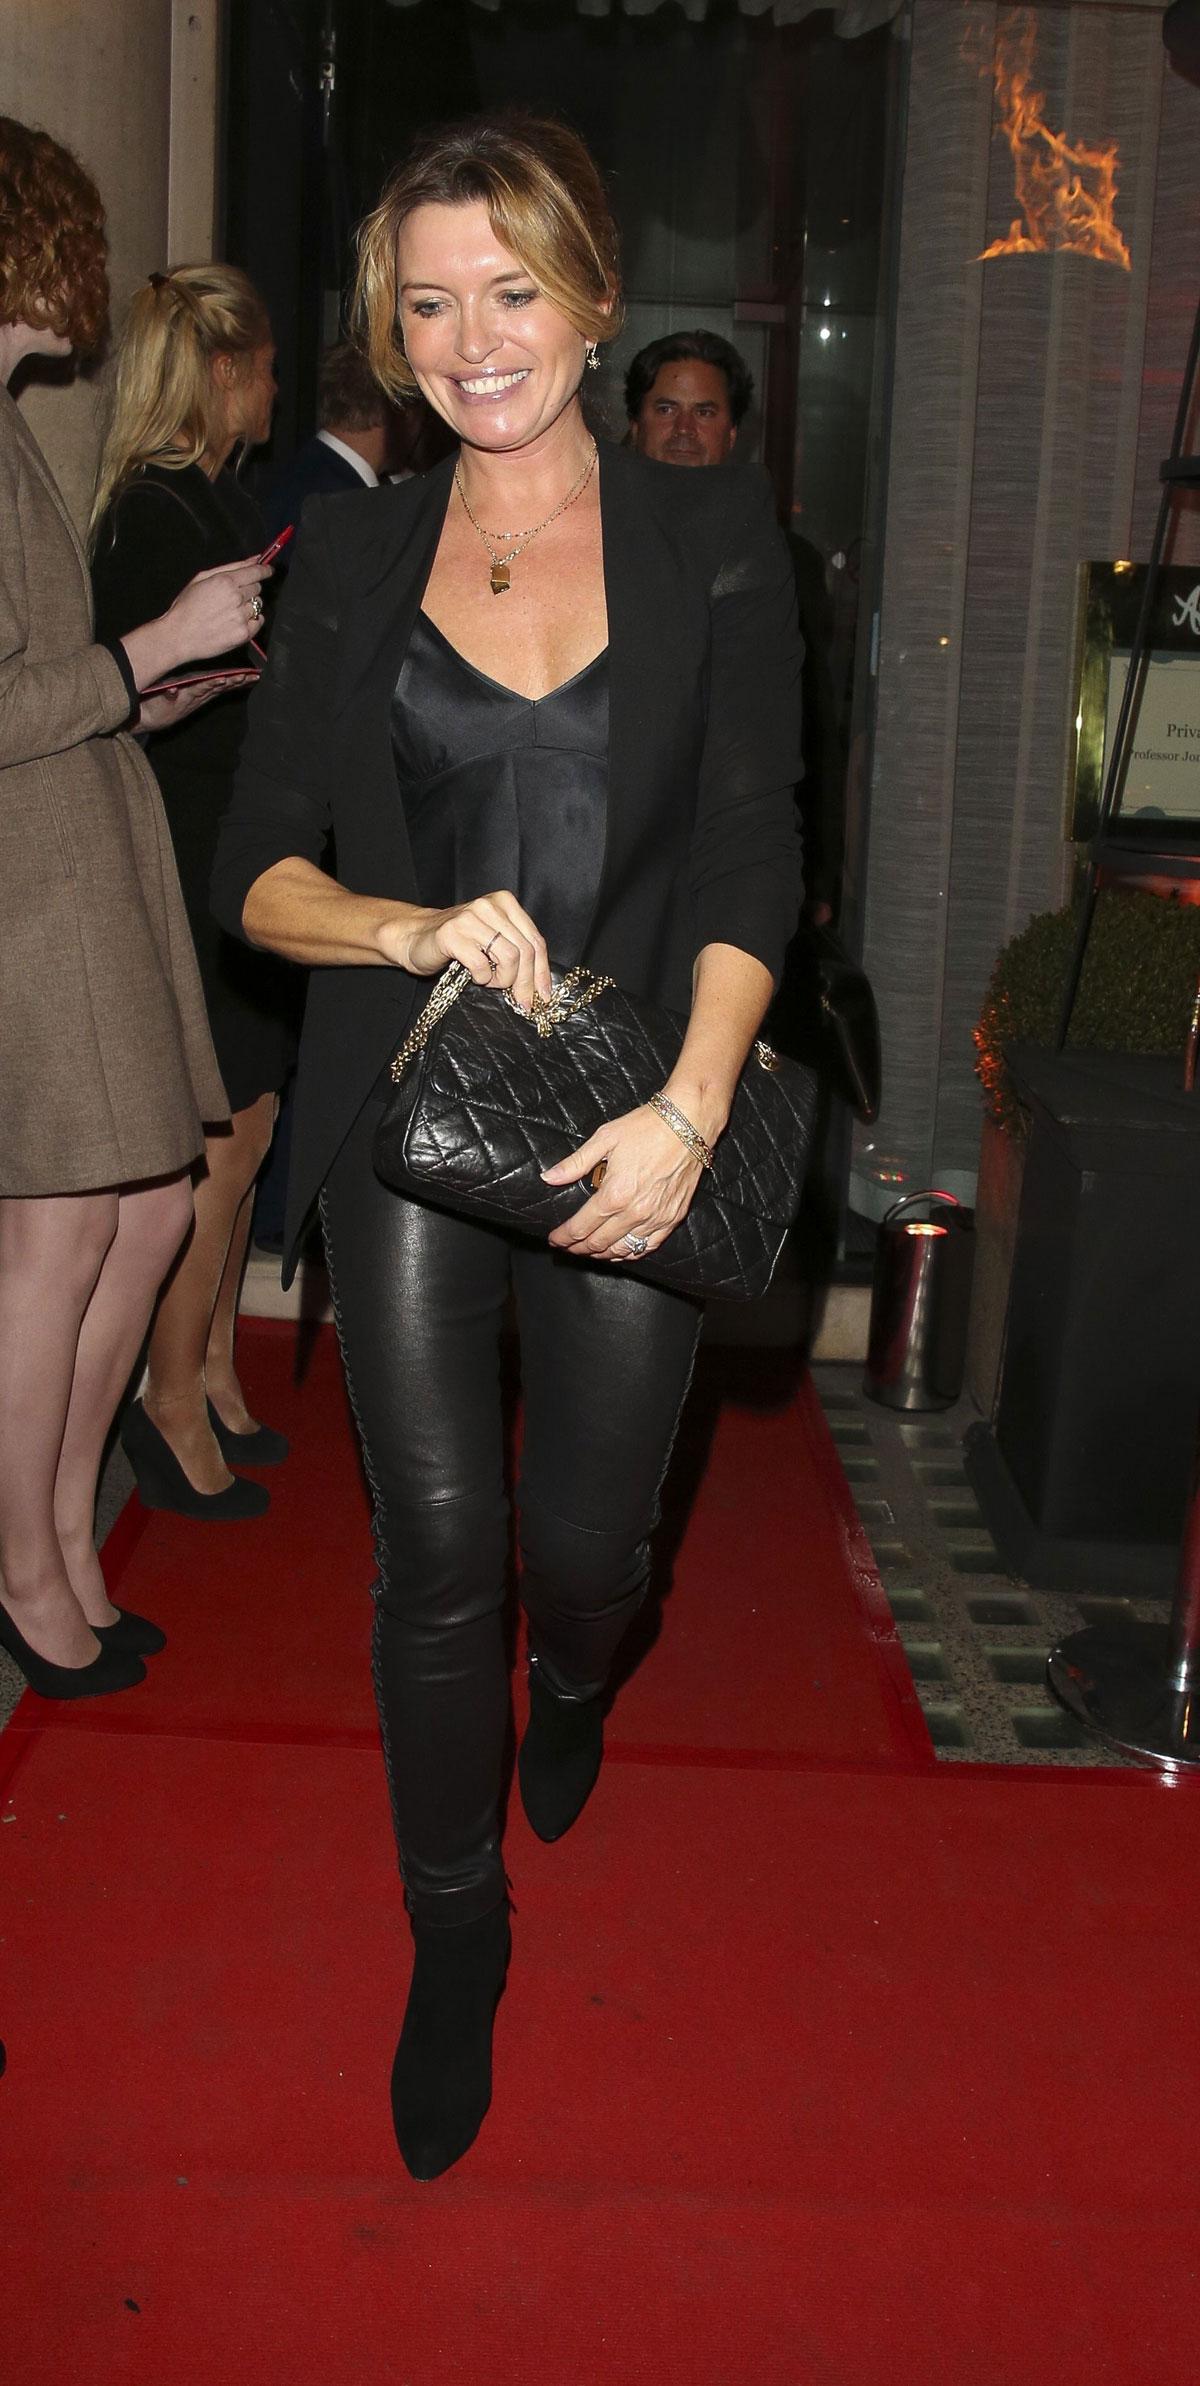 Tina Hobley attends Shalit OBE Party London